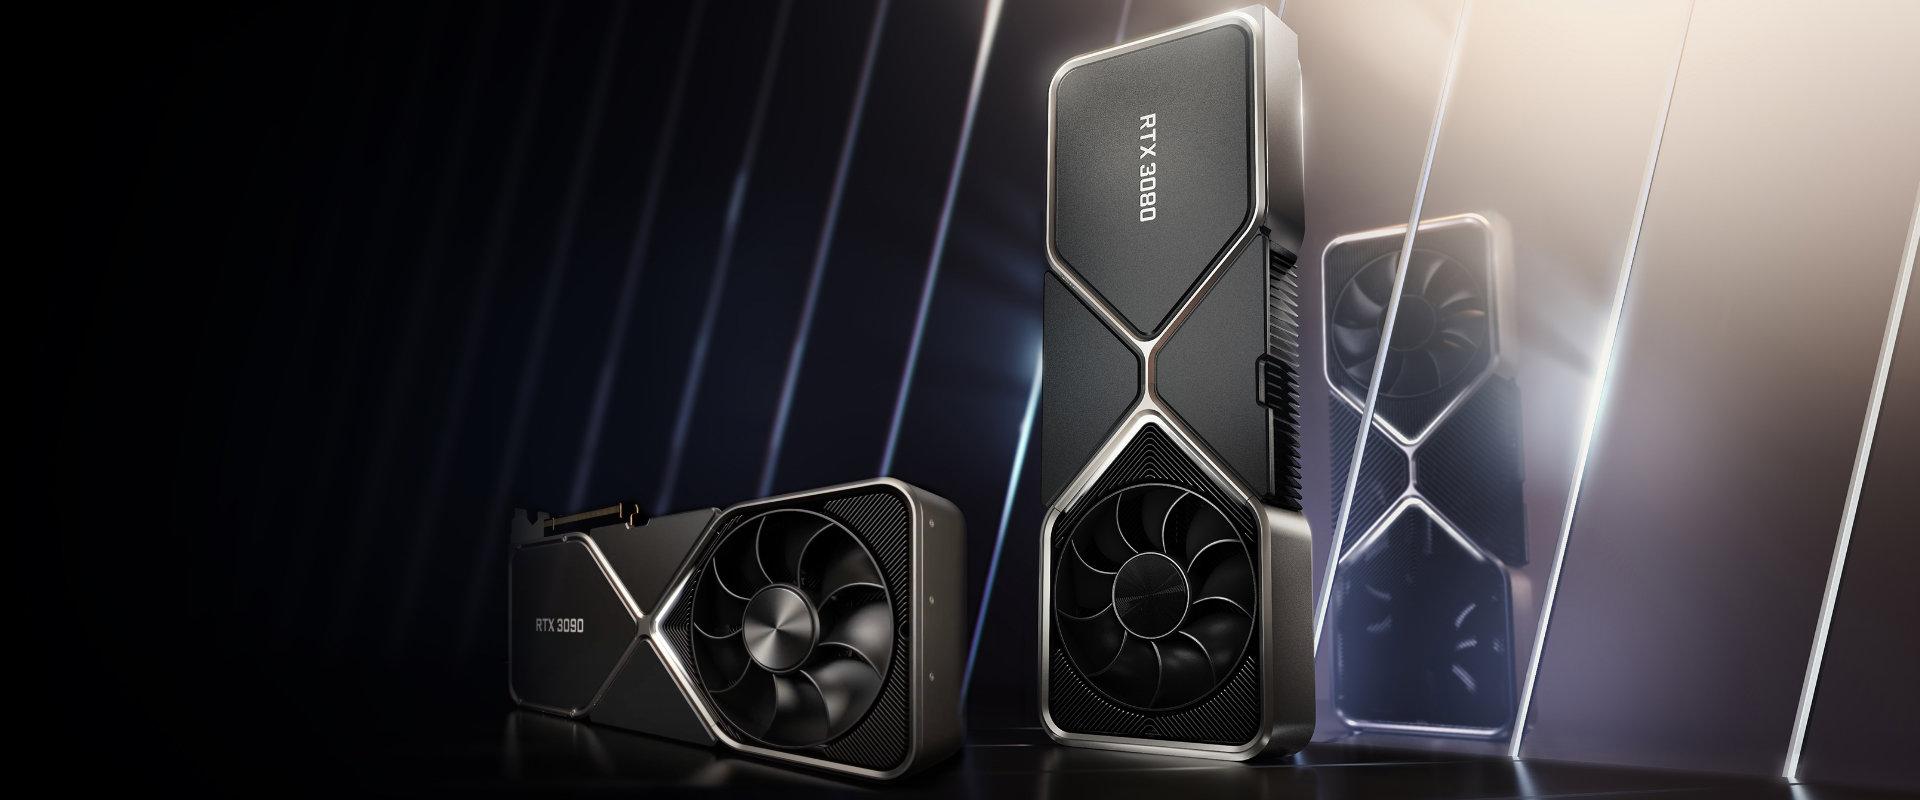 Grafičke kartice NVIDIA GeForce RTX 3080 i 3090